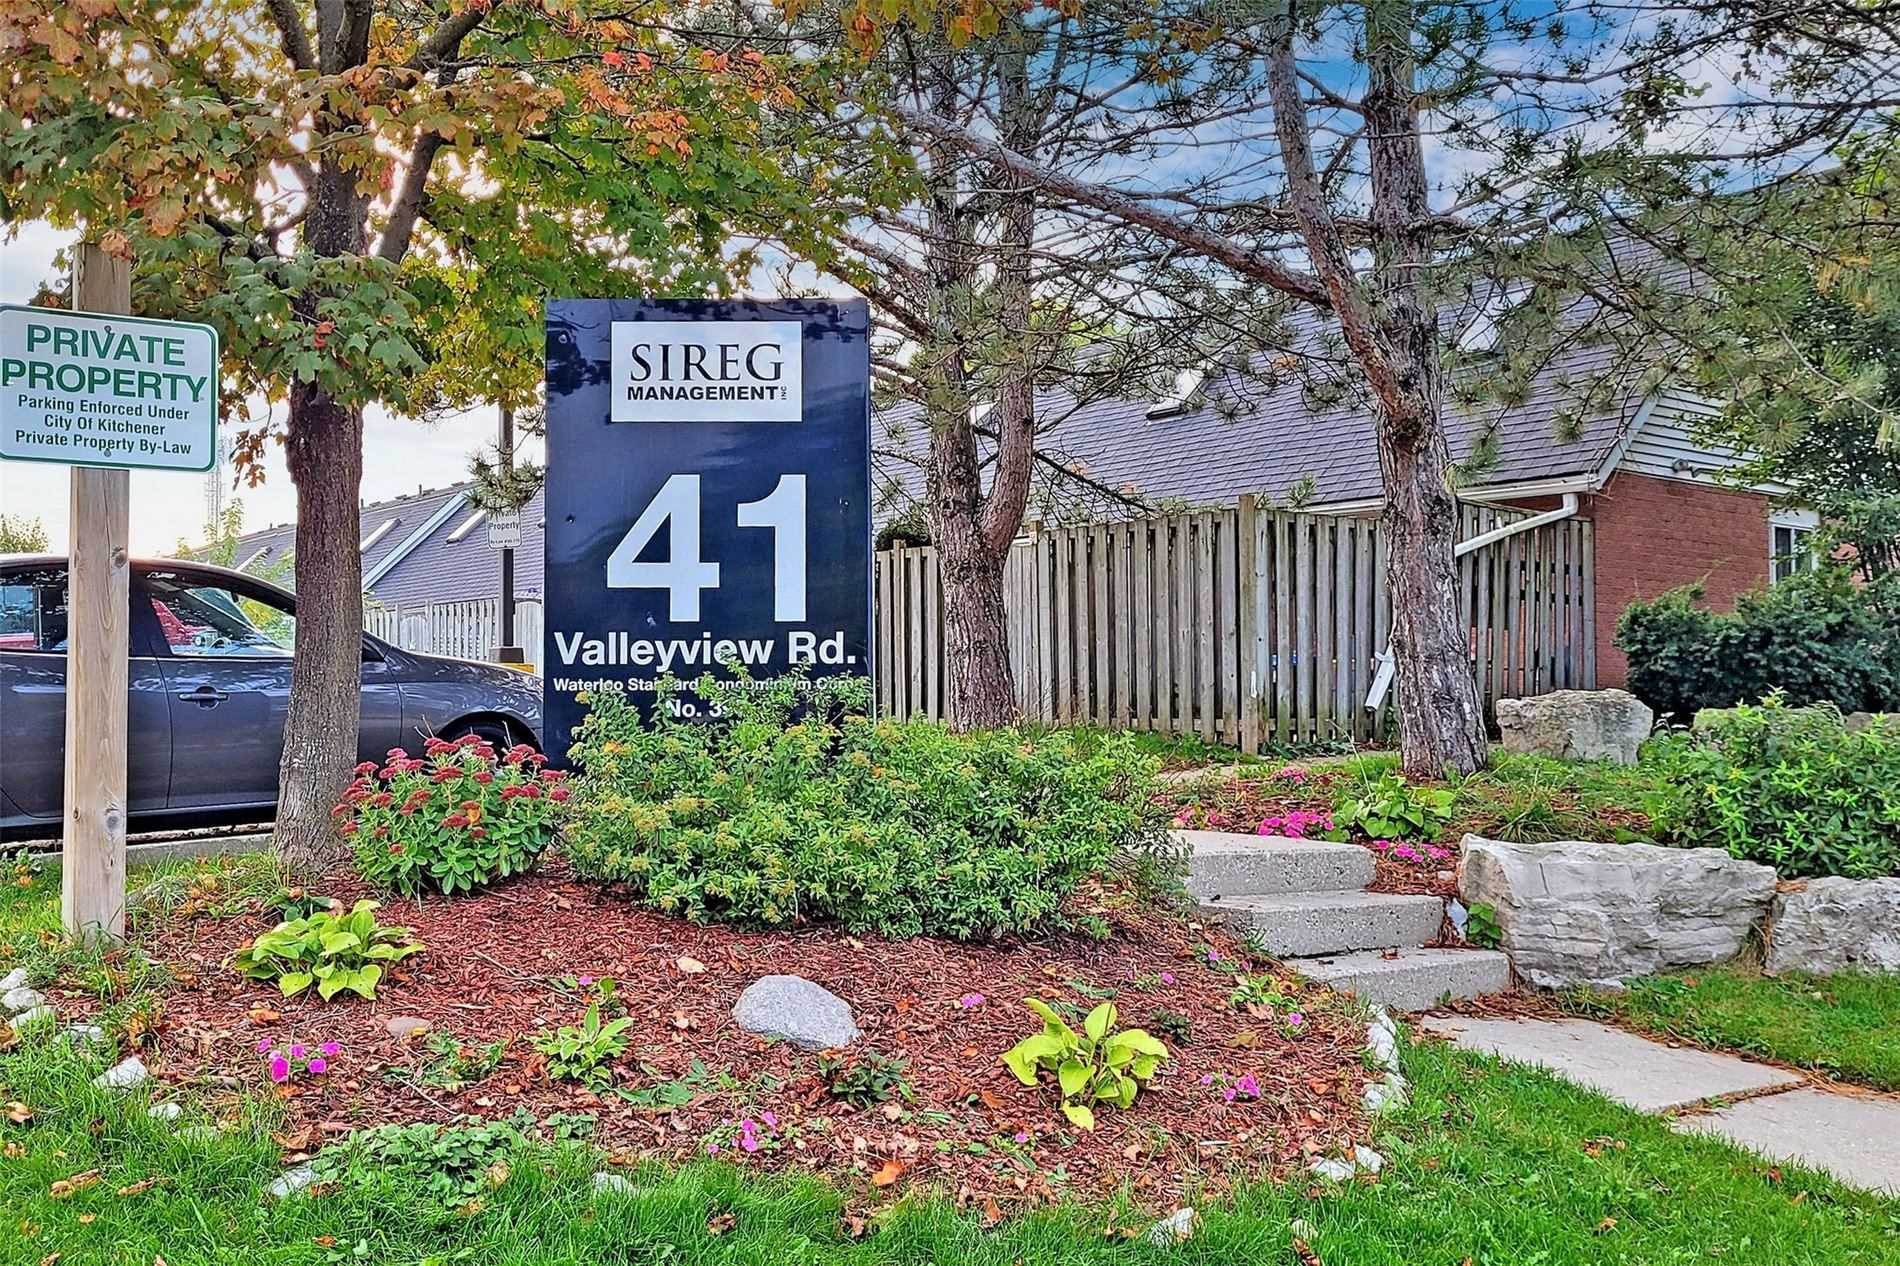 Condo Townhouse For Sale In Kitchener , 1 Bedroom Bedrooms, ,1 BathroomBathrooms,Condo Townhouse,For Sale,35,Valleyview